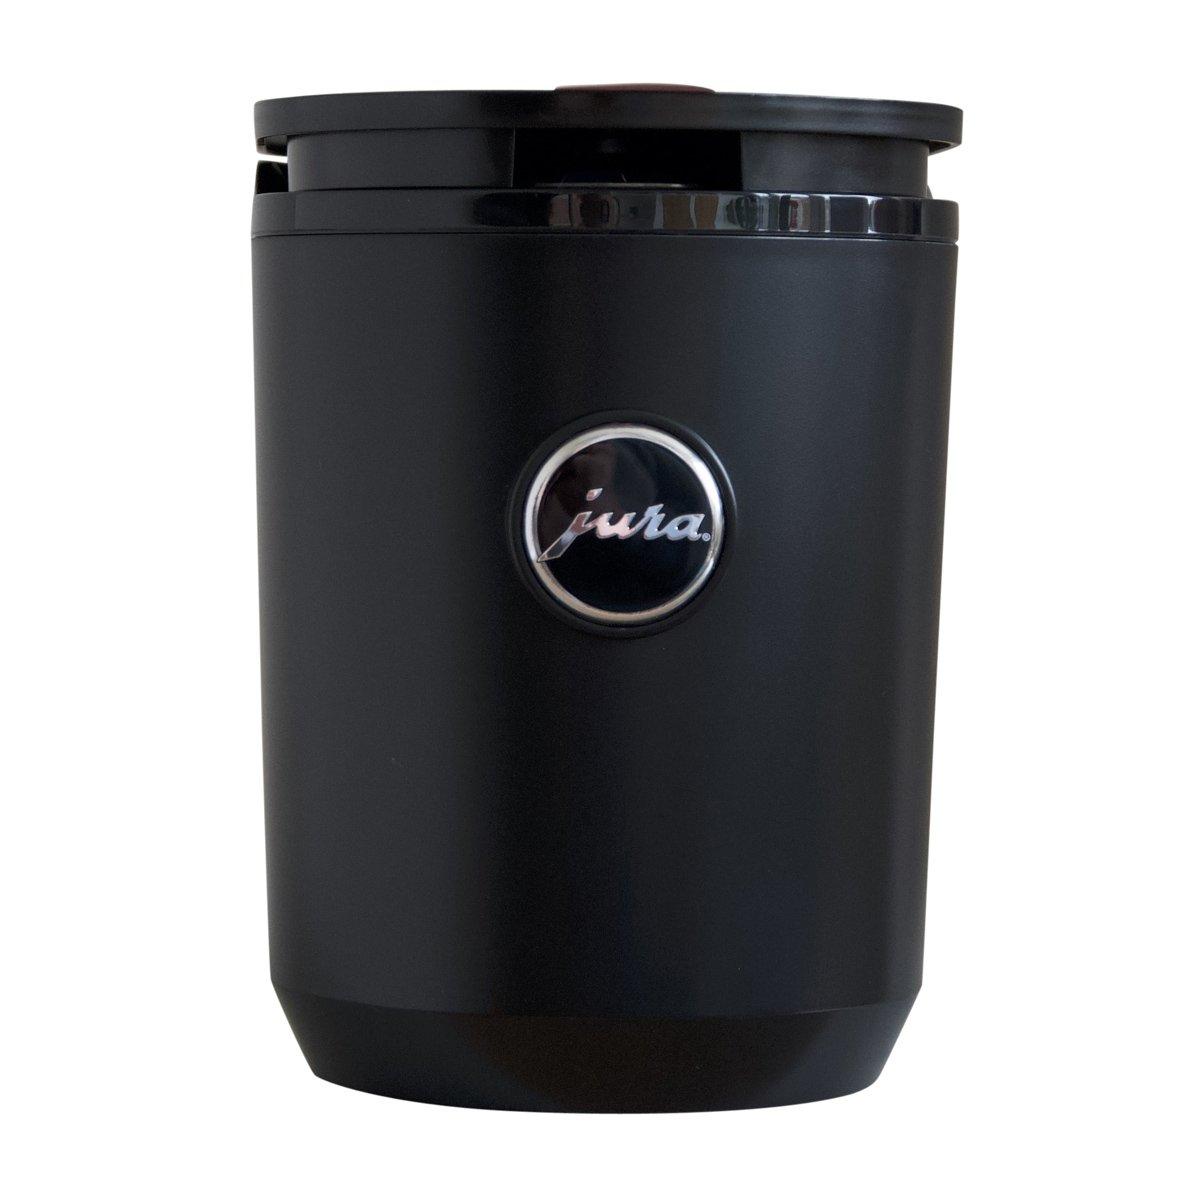 Jura Cool control 0,6 liter